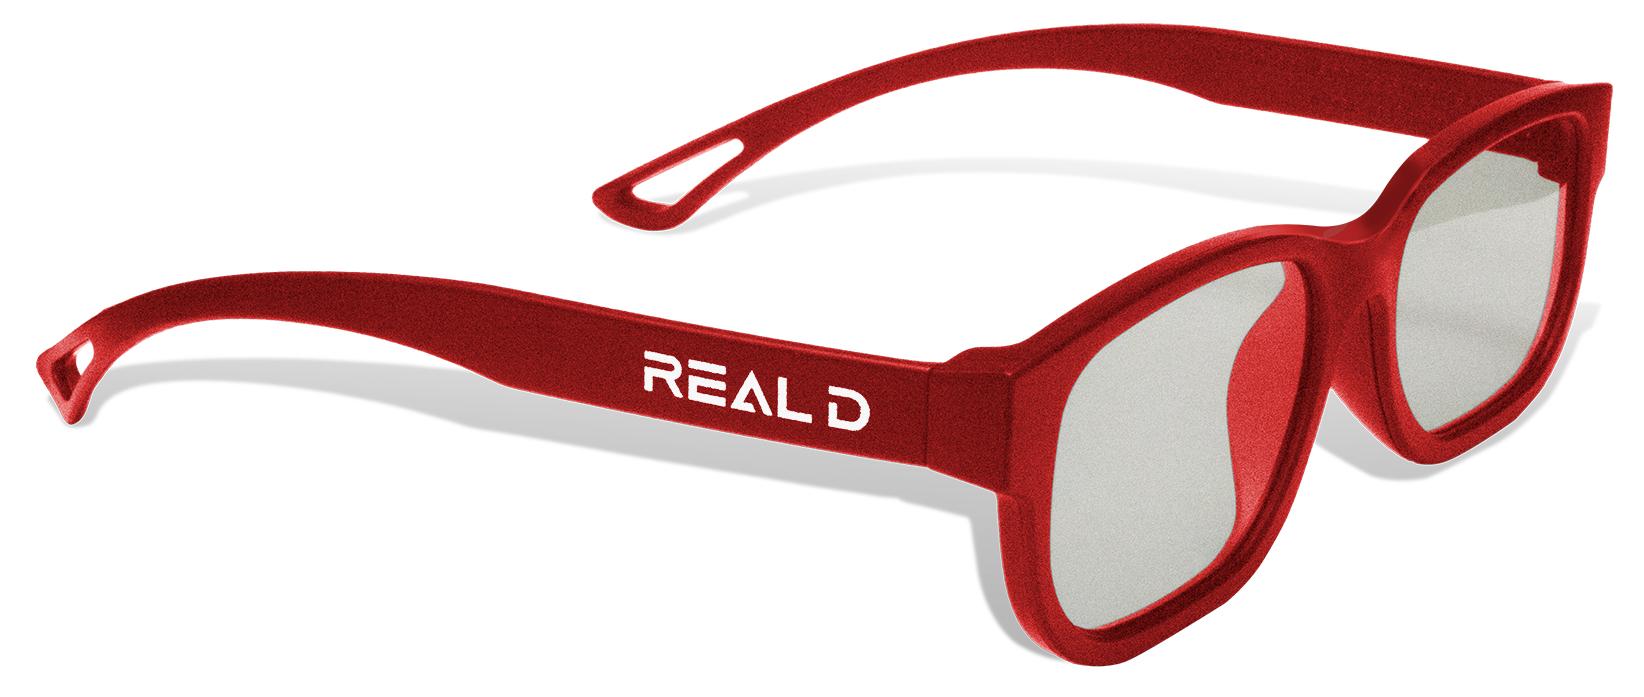 Red_3D_Real_D_Glasses.jpg